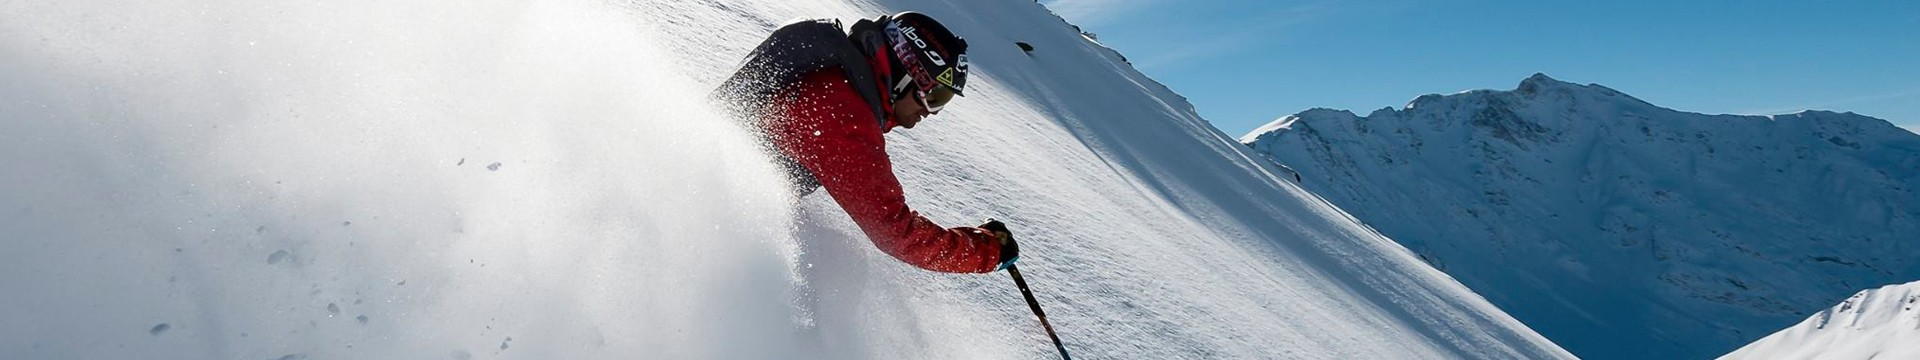 ski-06-8842